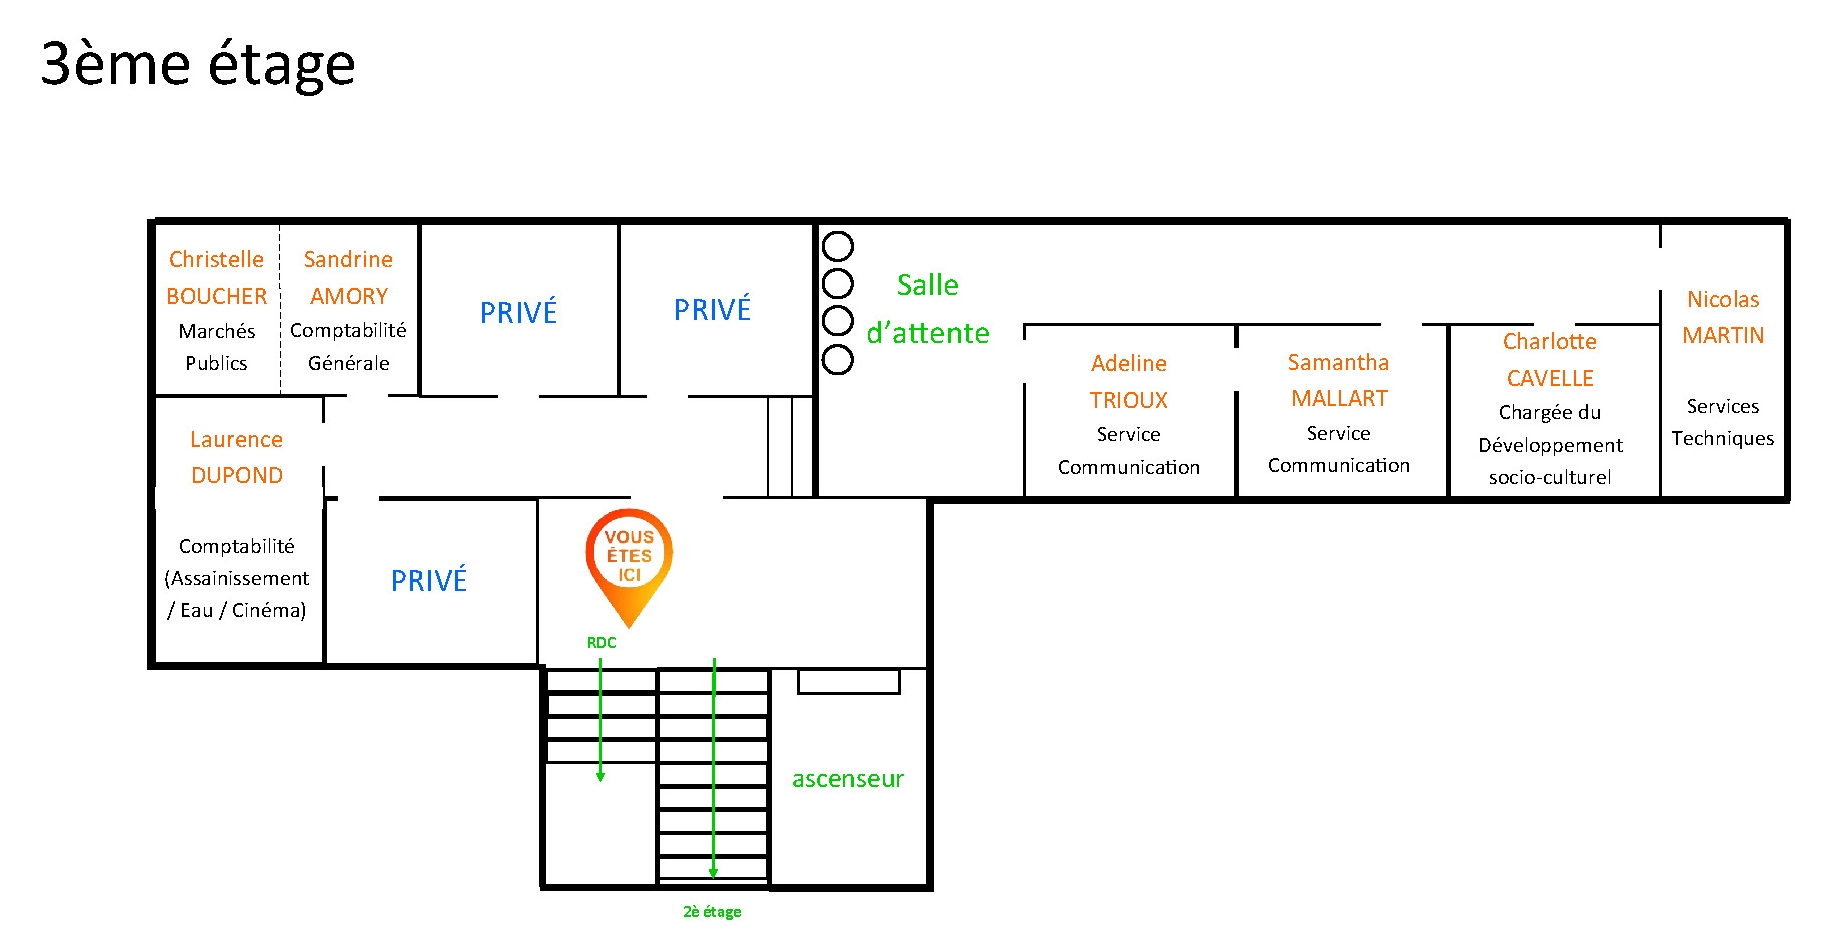 3eme_etage.jpg